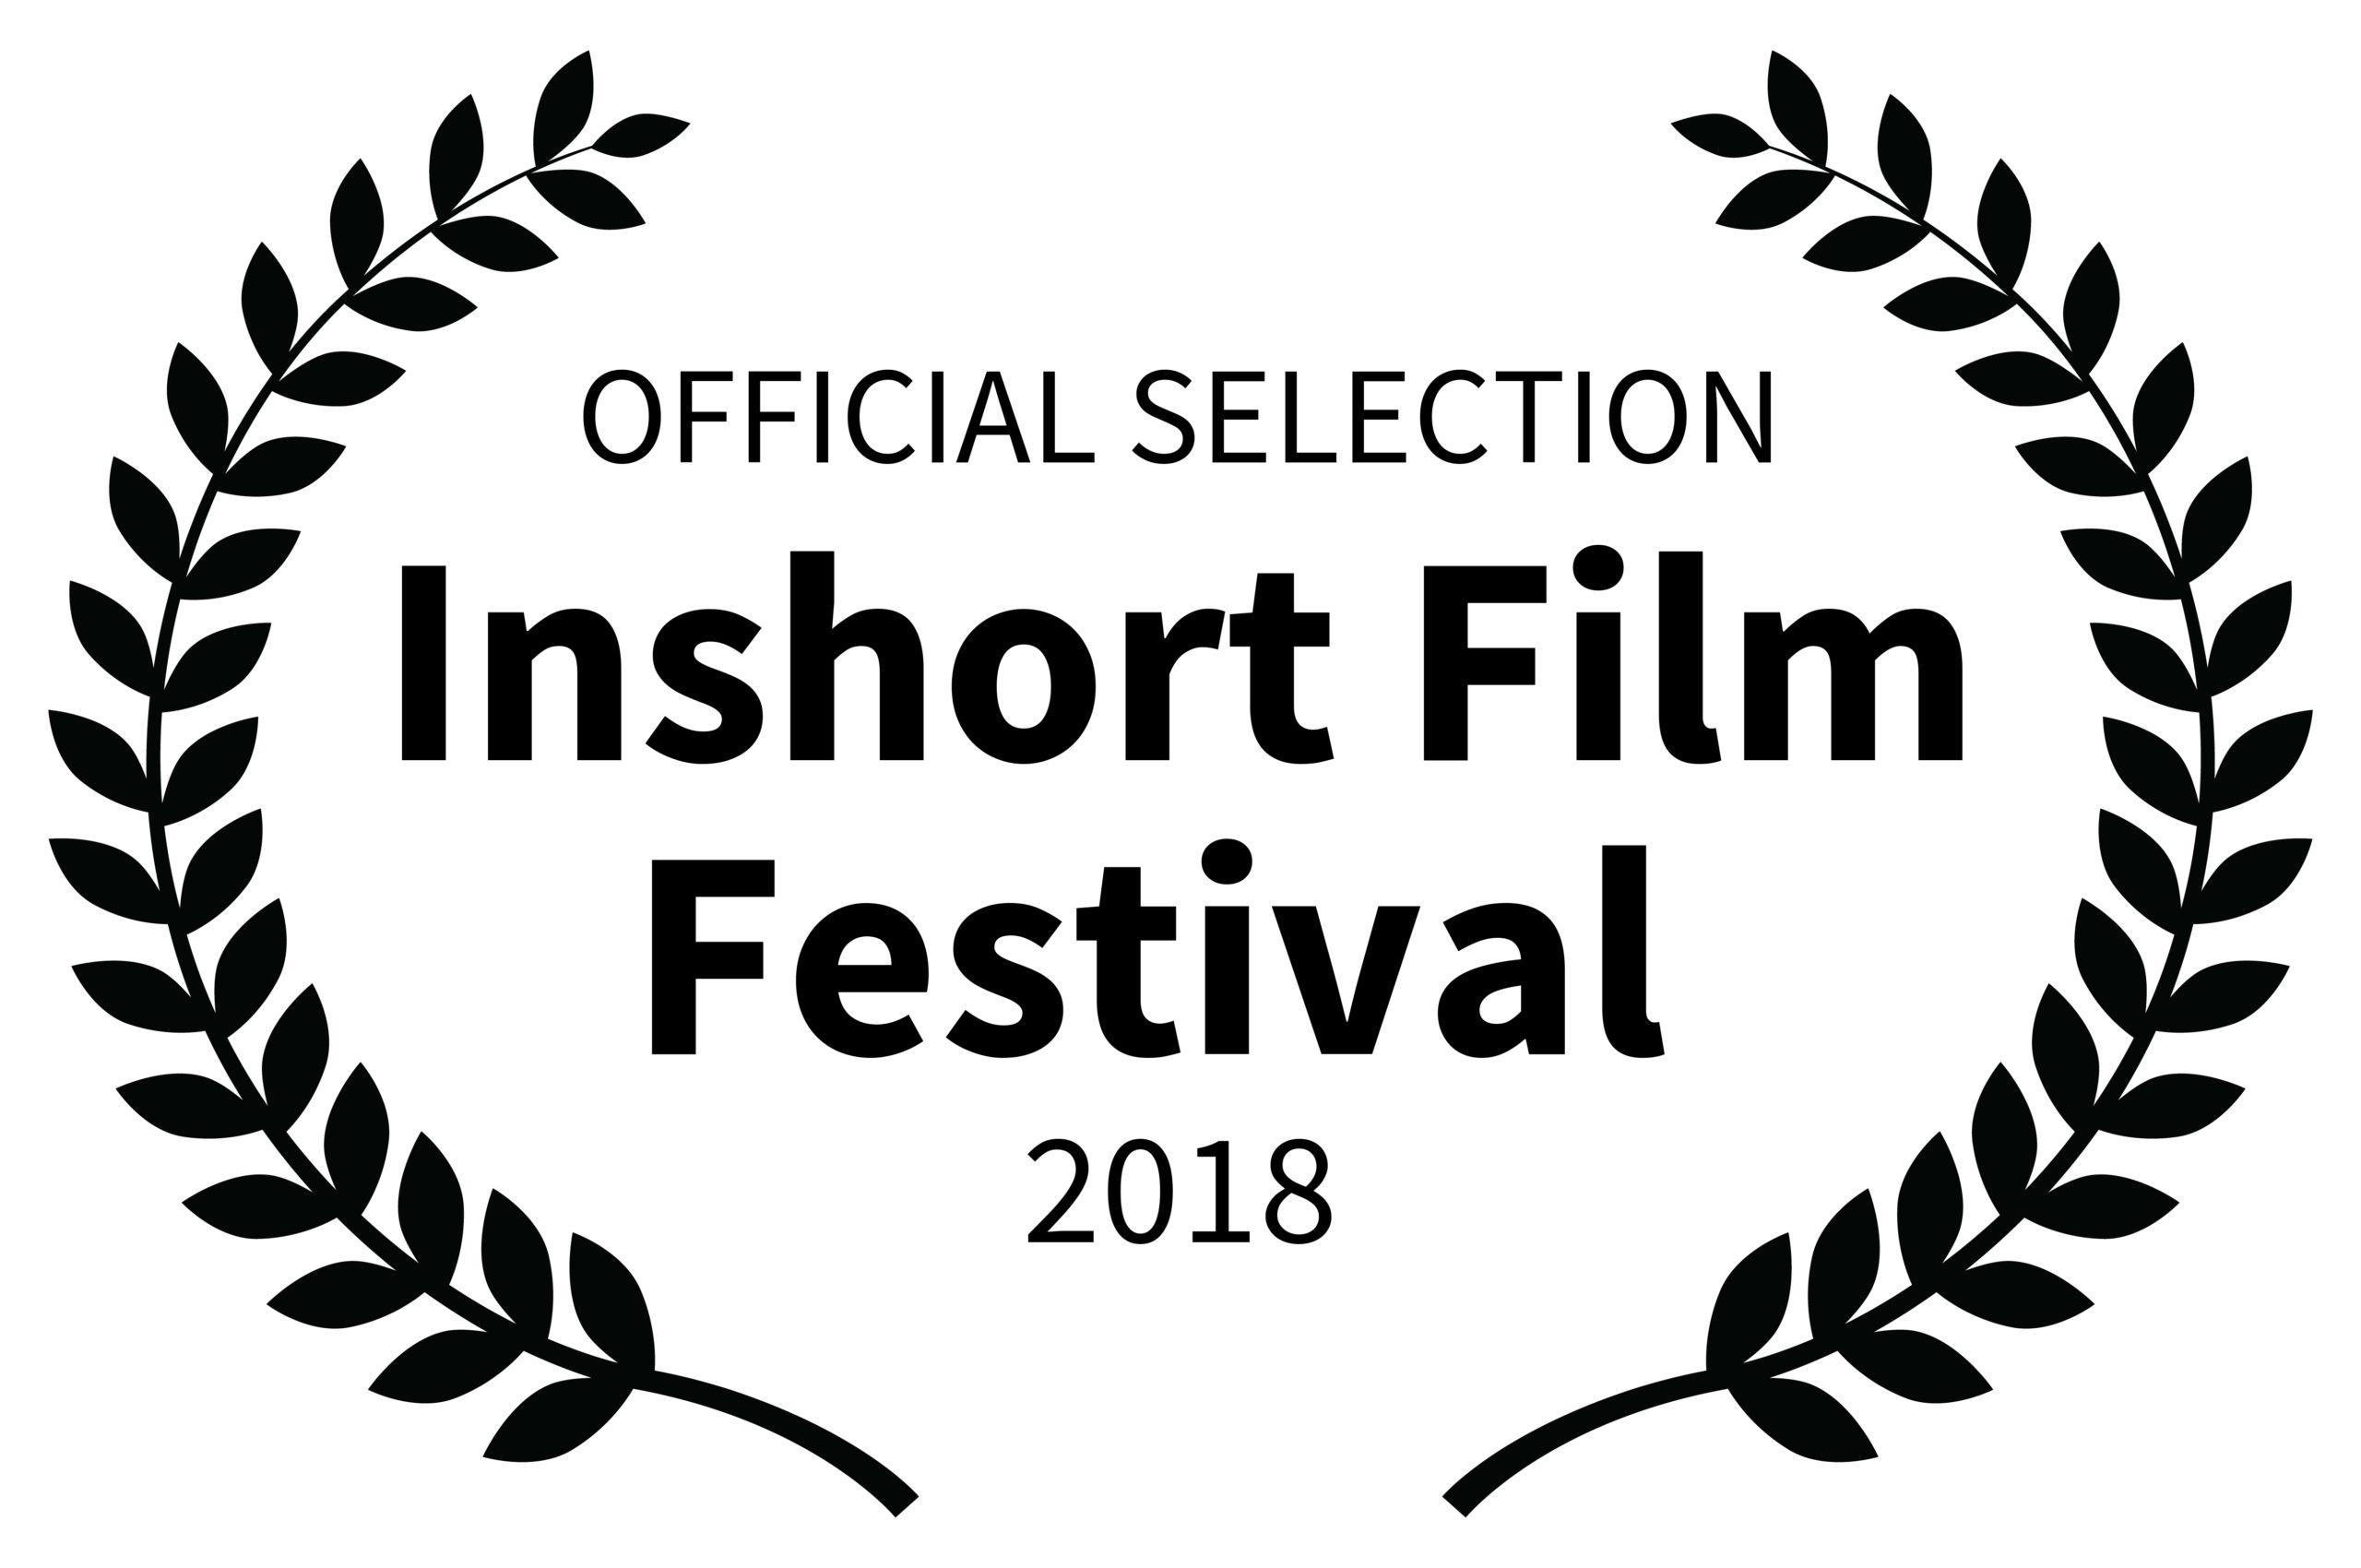 white sfondoOFFICIALSELECTION-InshortFilmFestival-2018